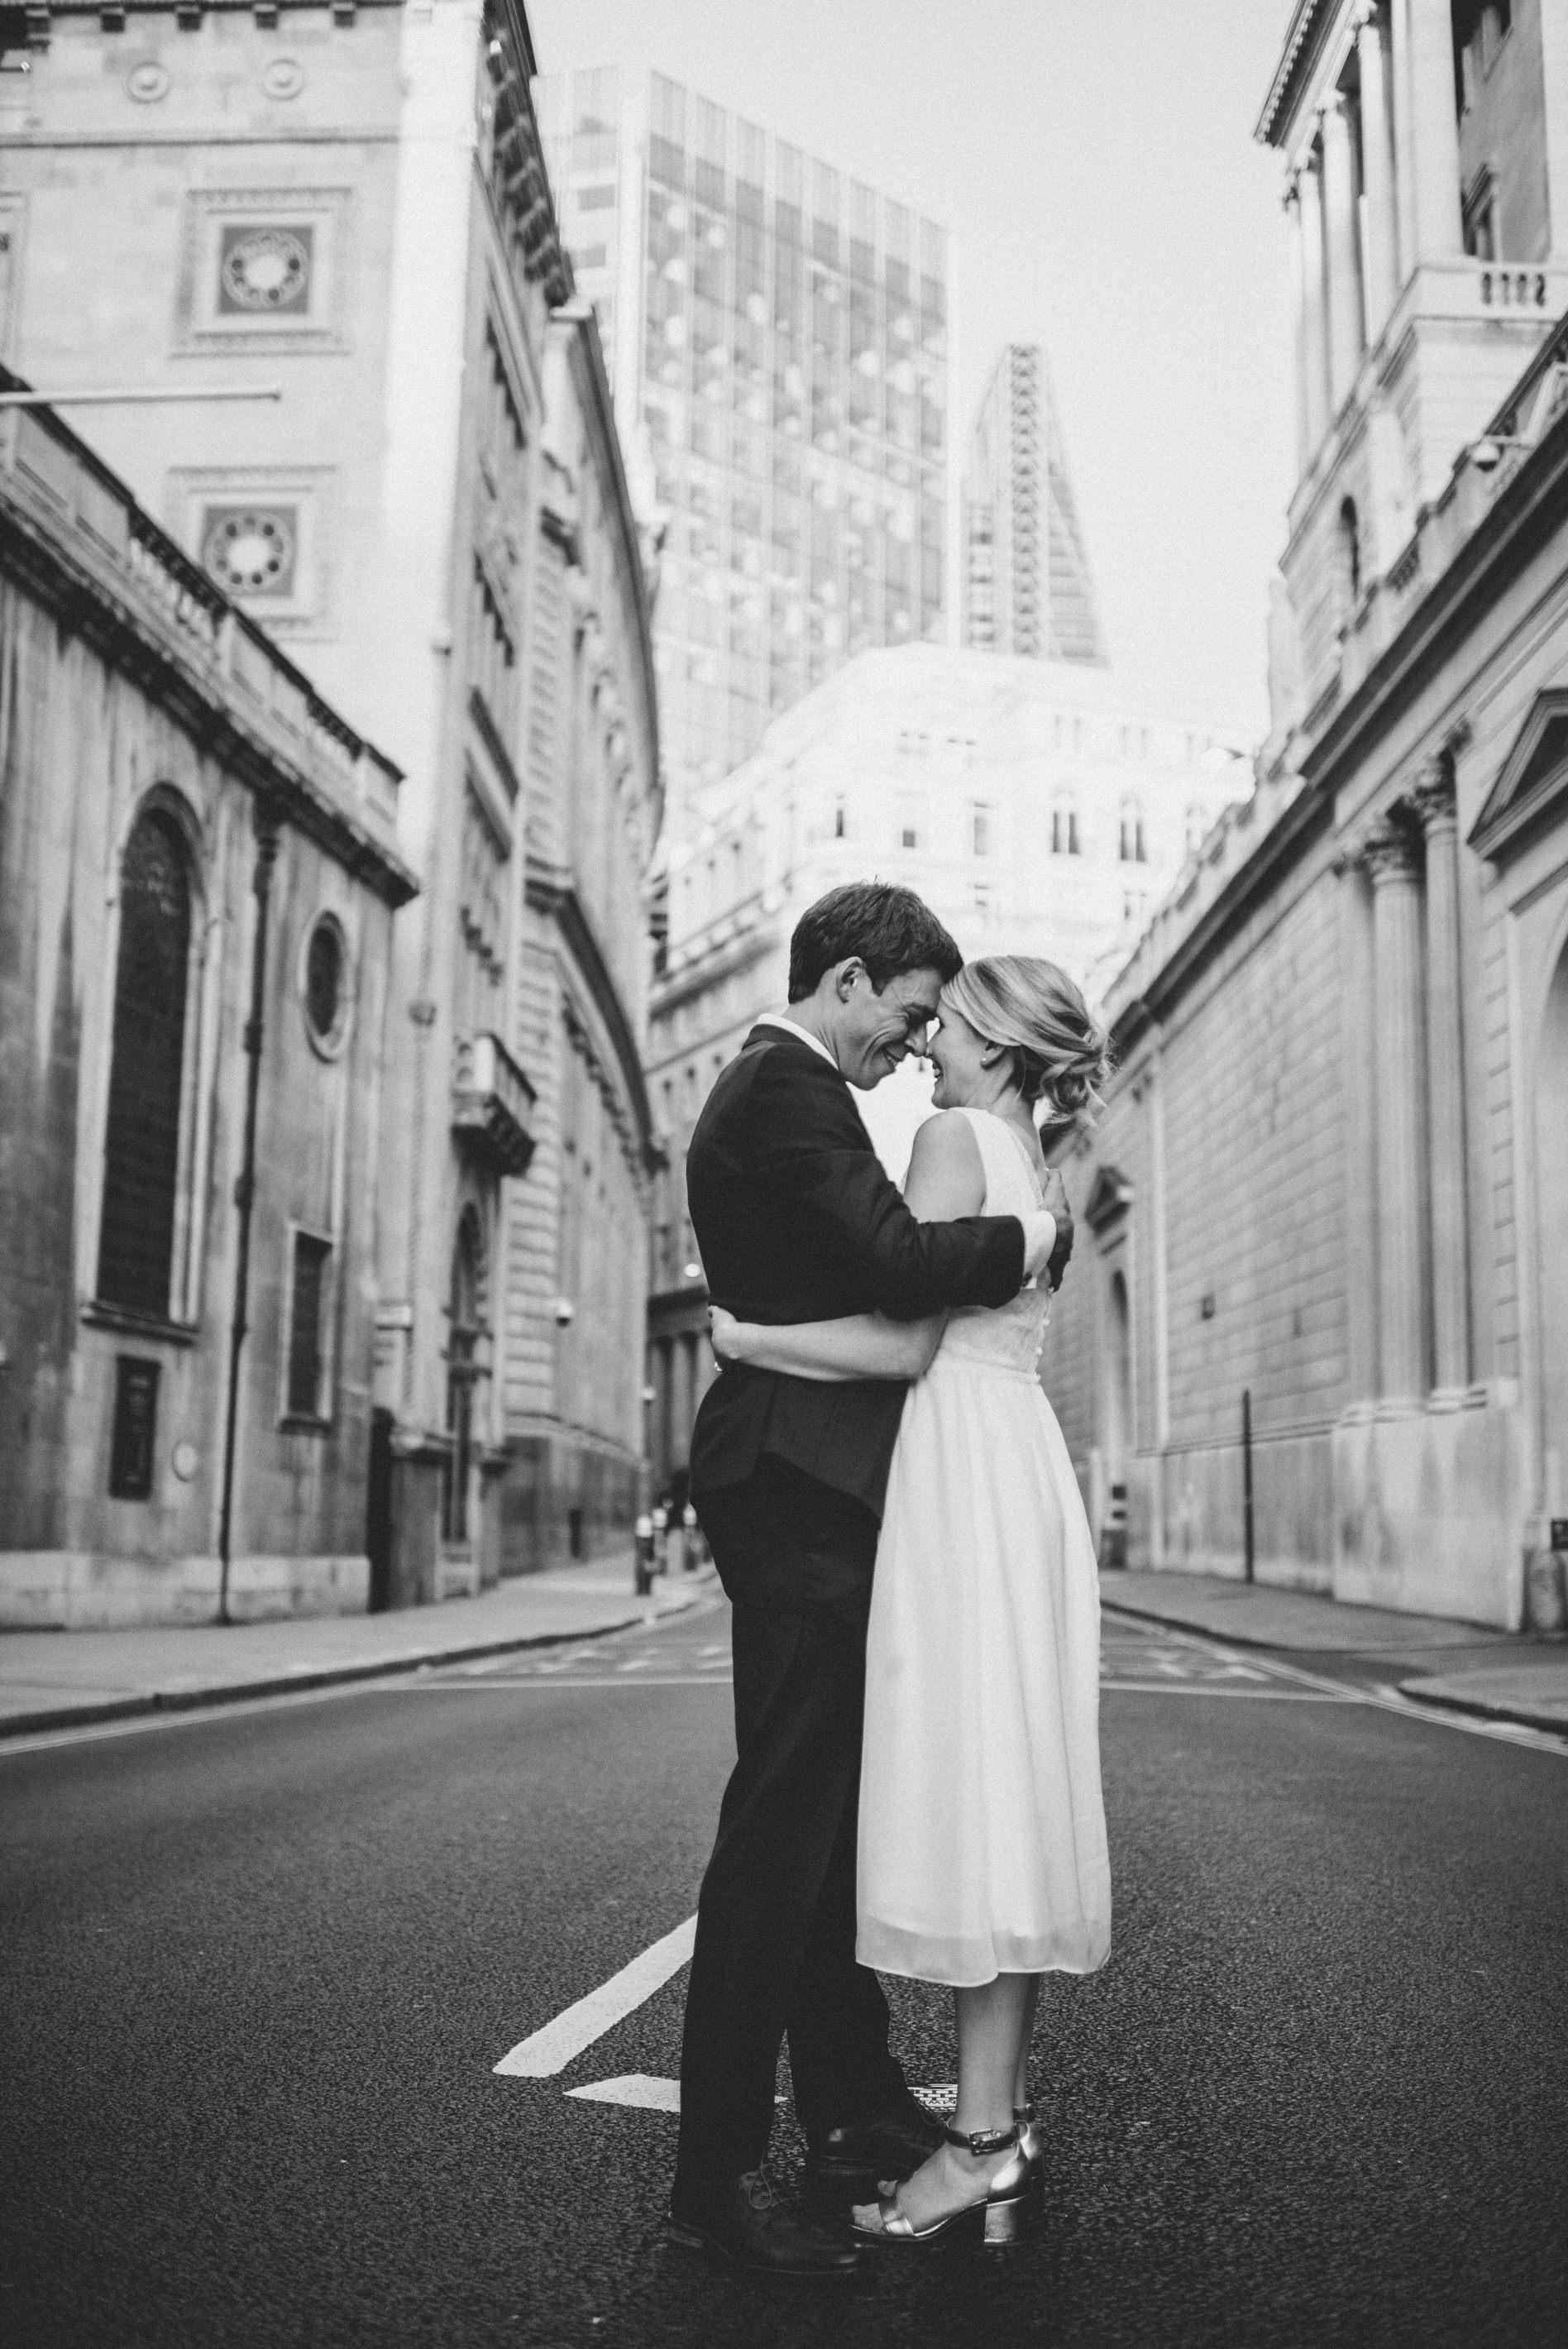 0138-LISA-DEVINE-PHOTOGRAPHY-ALTERNATIVE-WEDDING-PHOTOGRAPHY-SCOTLAND-DESTINATION-WEDDINGS-GLASGOW-WEDDINGS-COOL-WEDDINGS-STYLISH-WEDDINGS.JPG